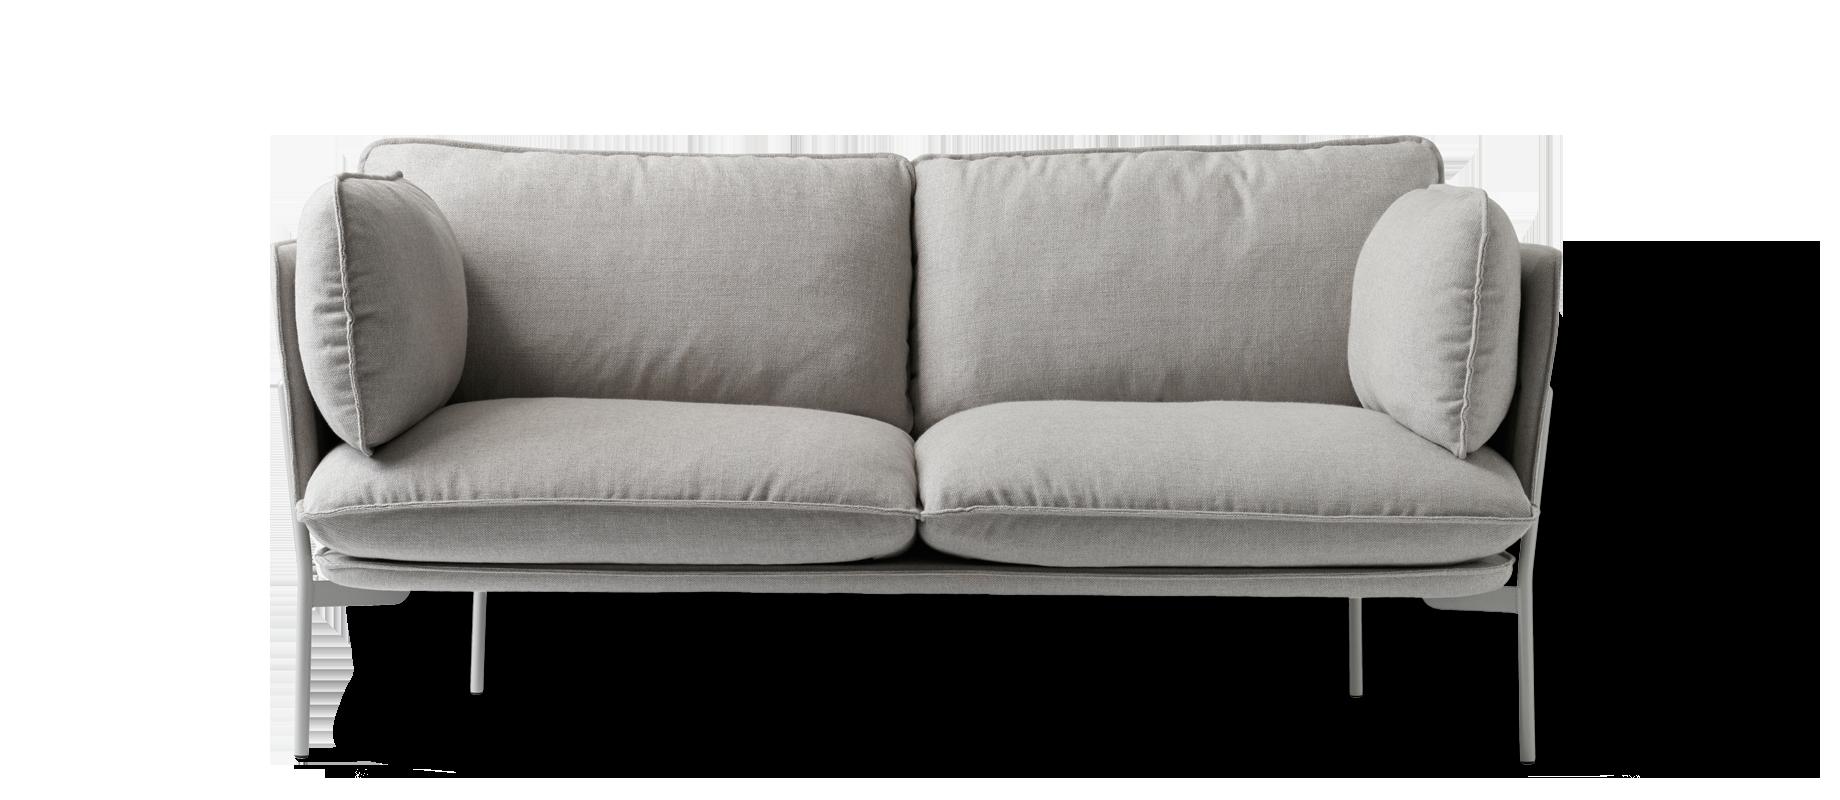 Kitchenaid produkter: Cloud soffa